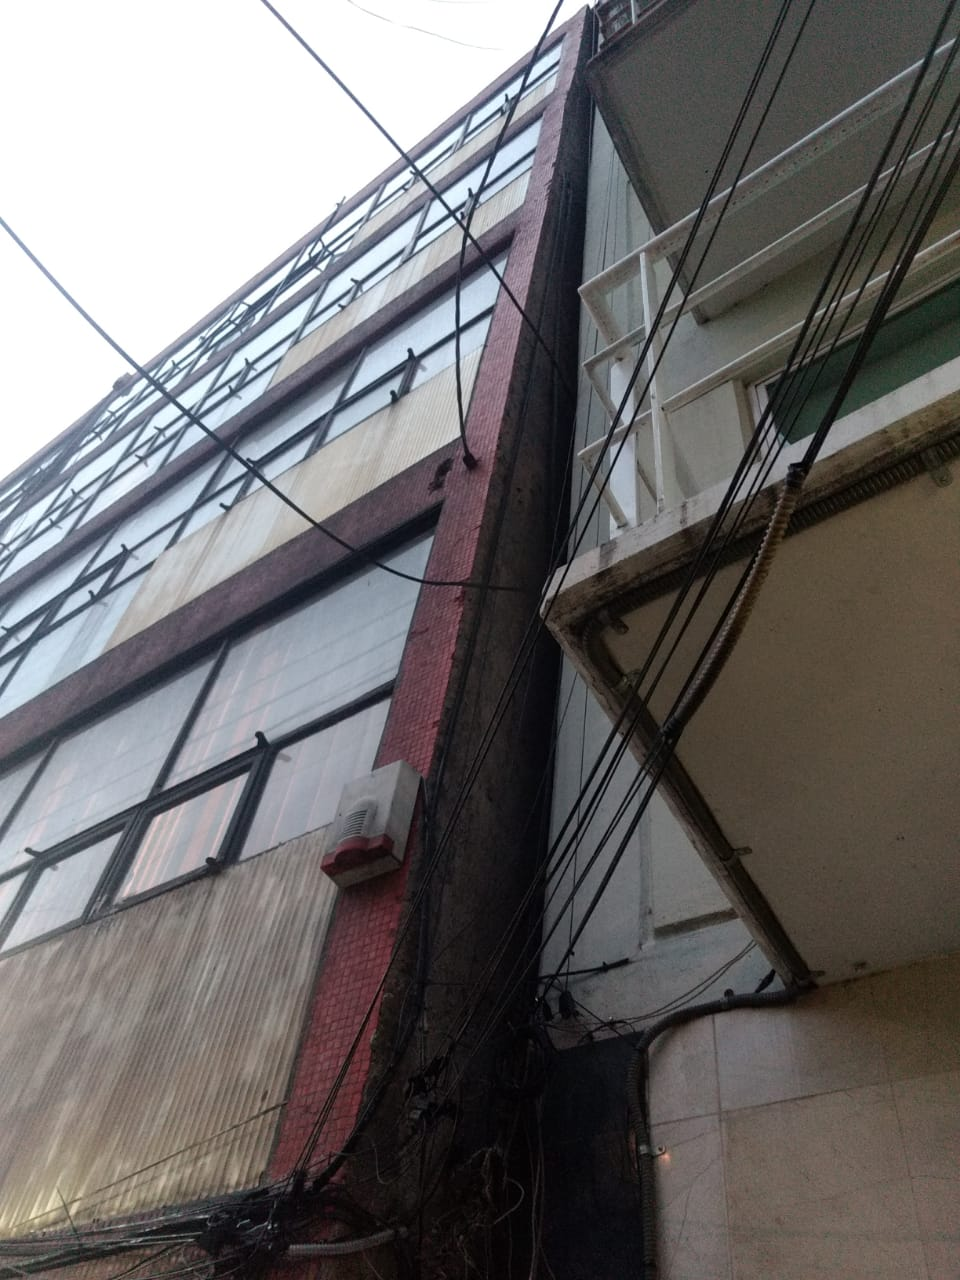 xochicalco-edificio-inclinado-mexico-cdmx-sismo-19S-3-años-reconstruccion-damnificados-unidos-03